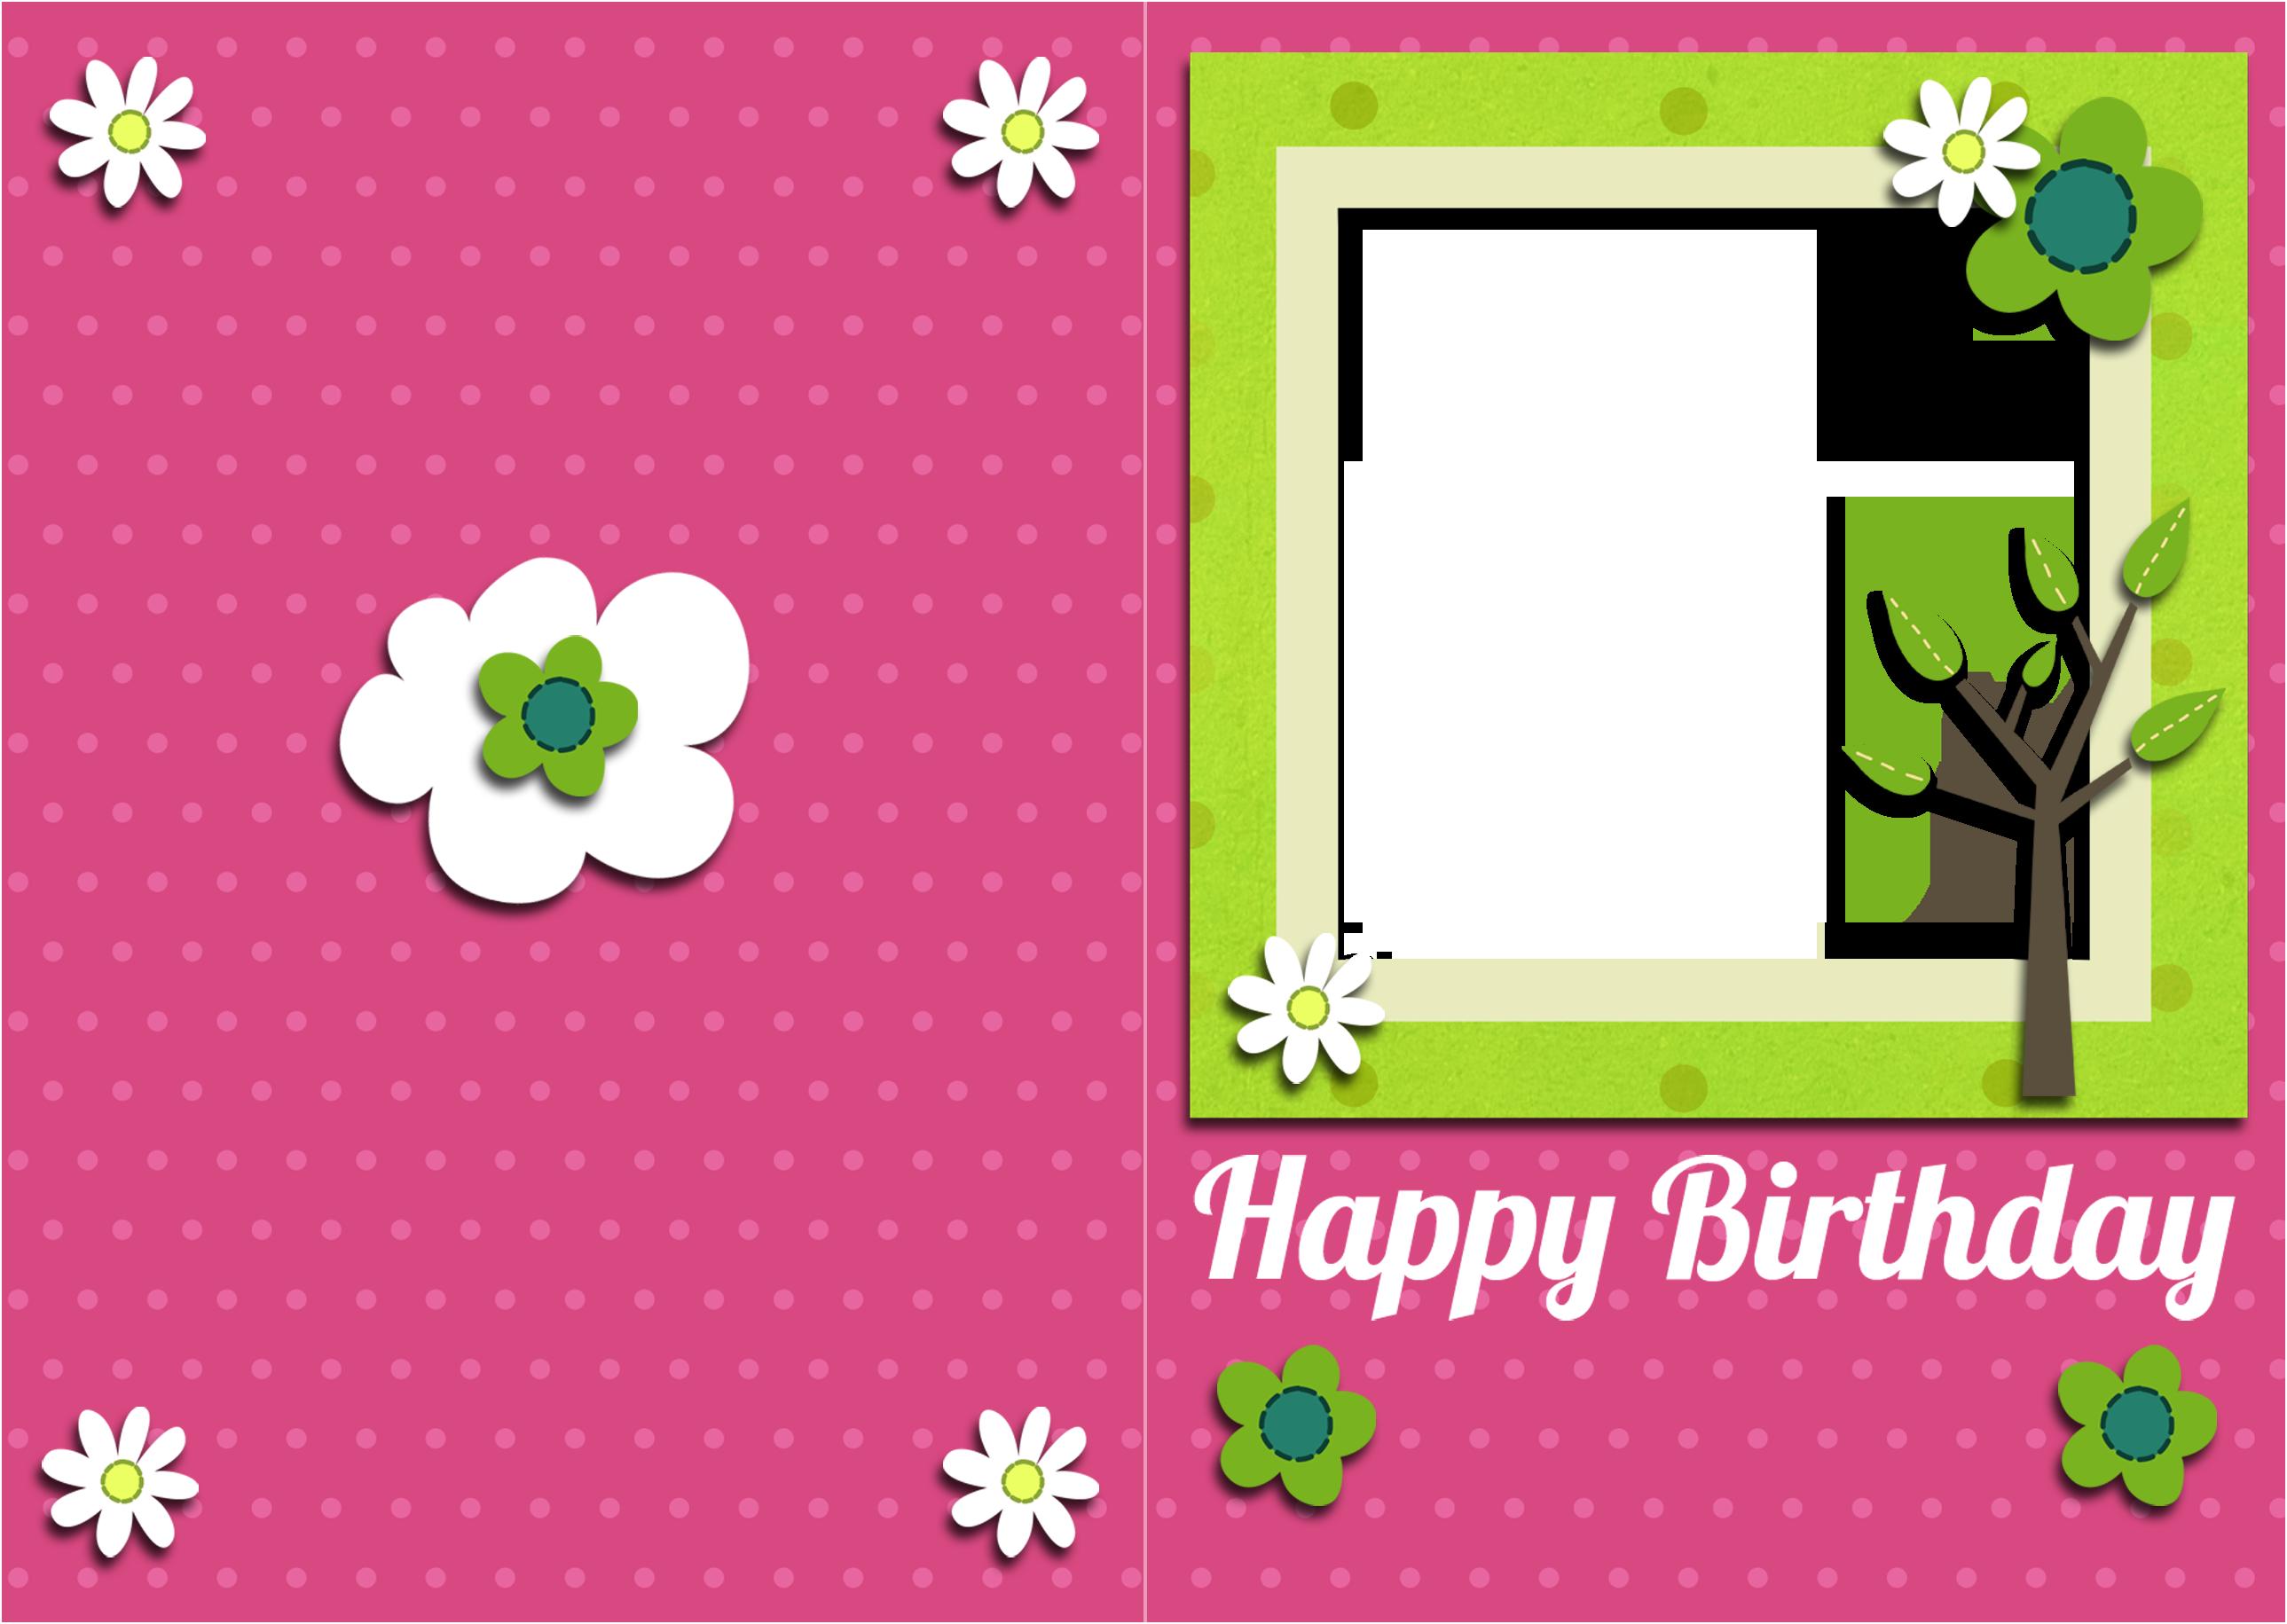 printablebirthdaycard Free birthday card, Happy